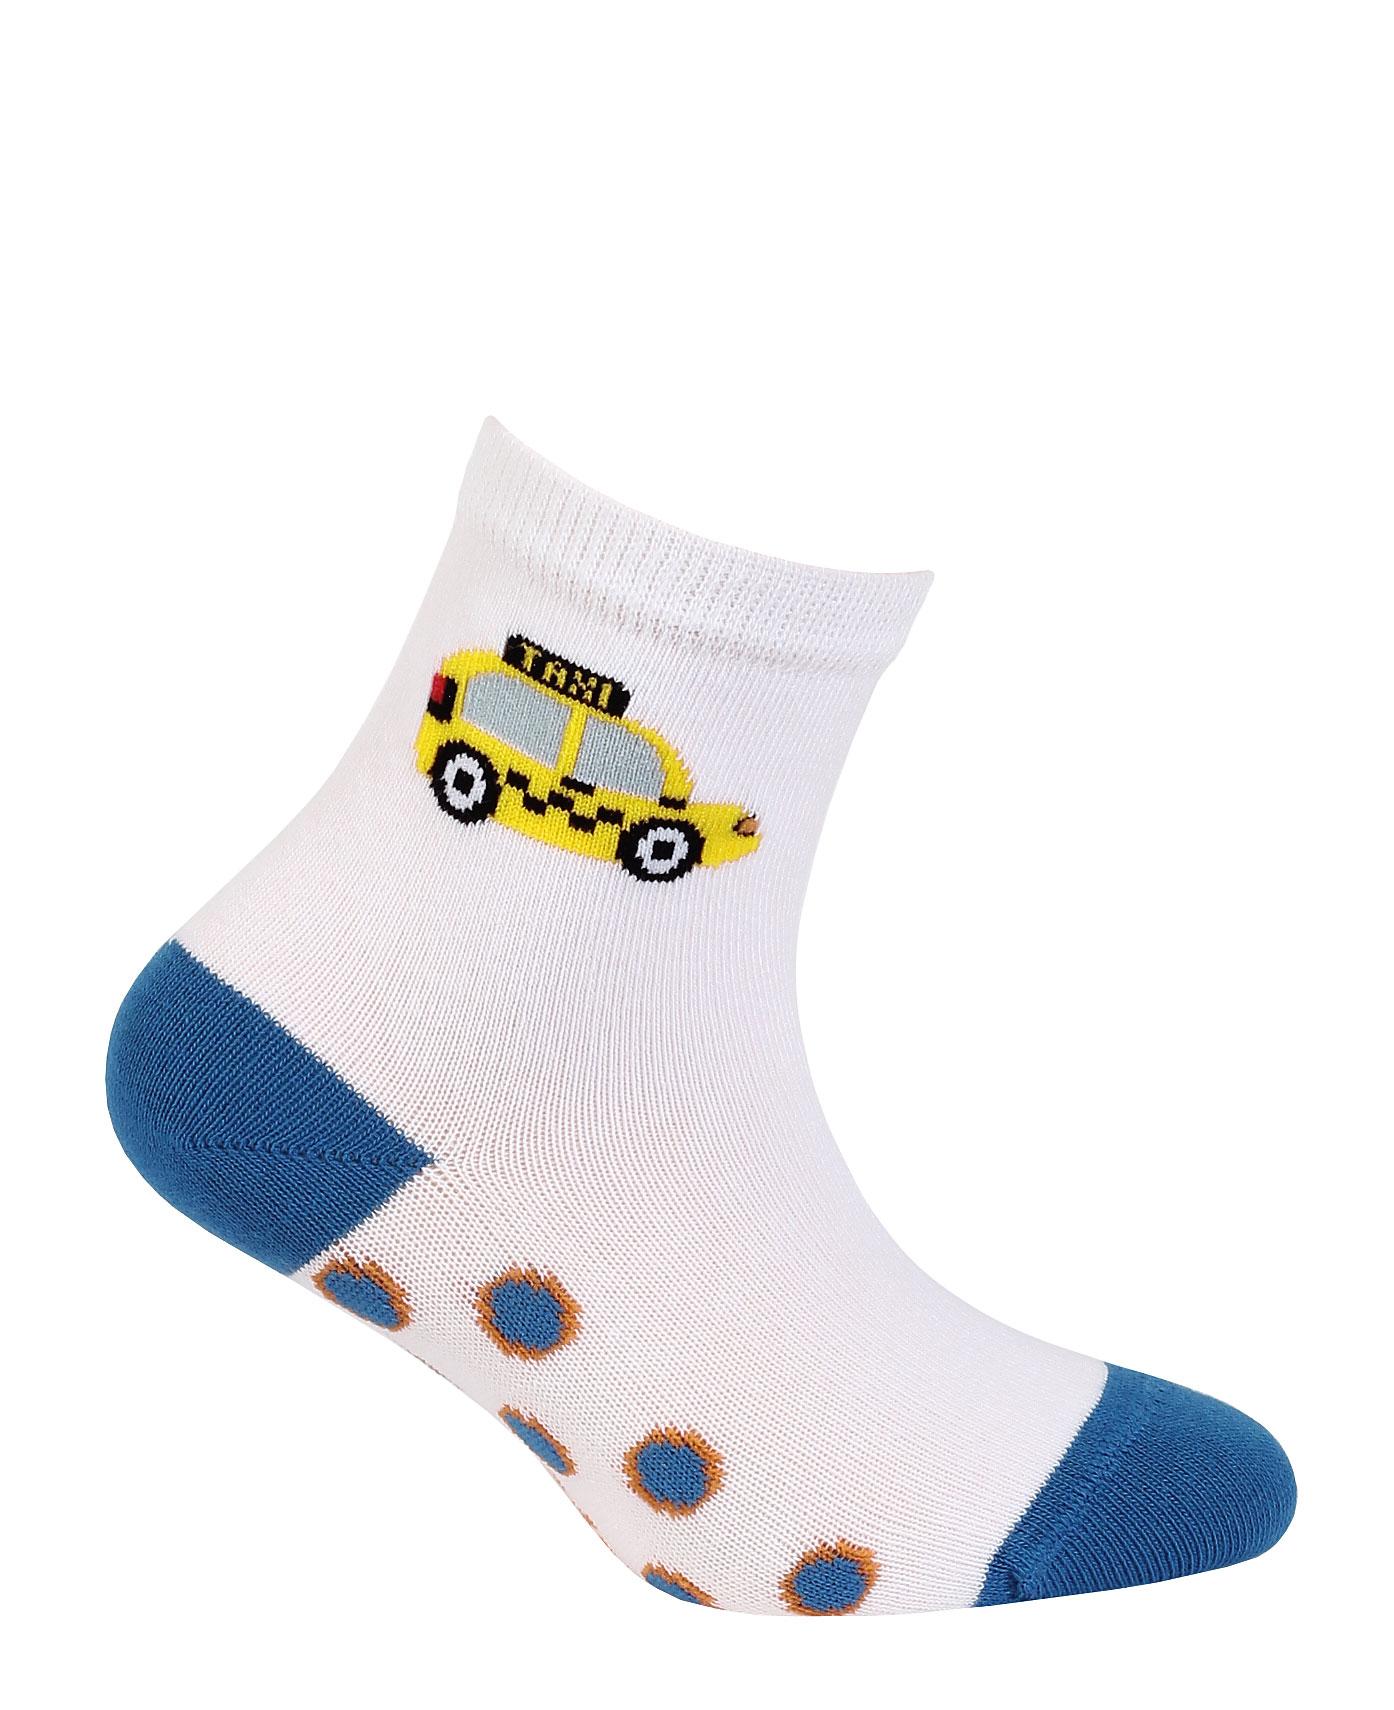 dětské ponožky vzor WOLA TAXI šedé 21-23